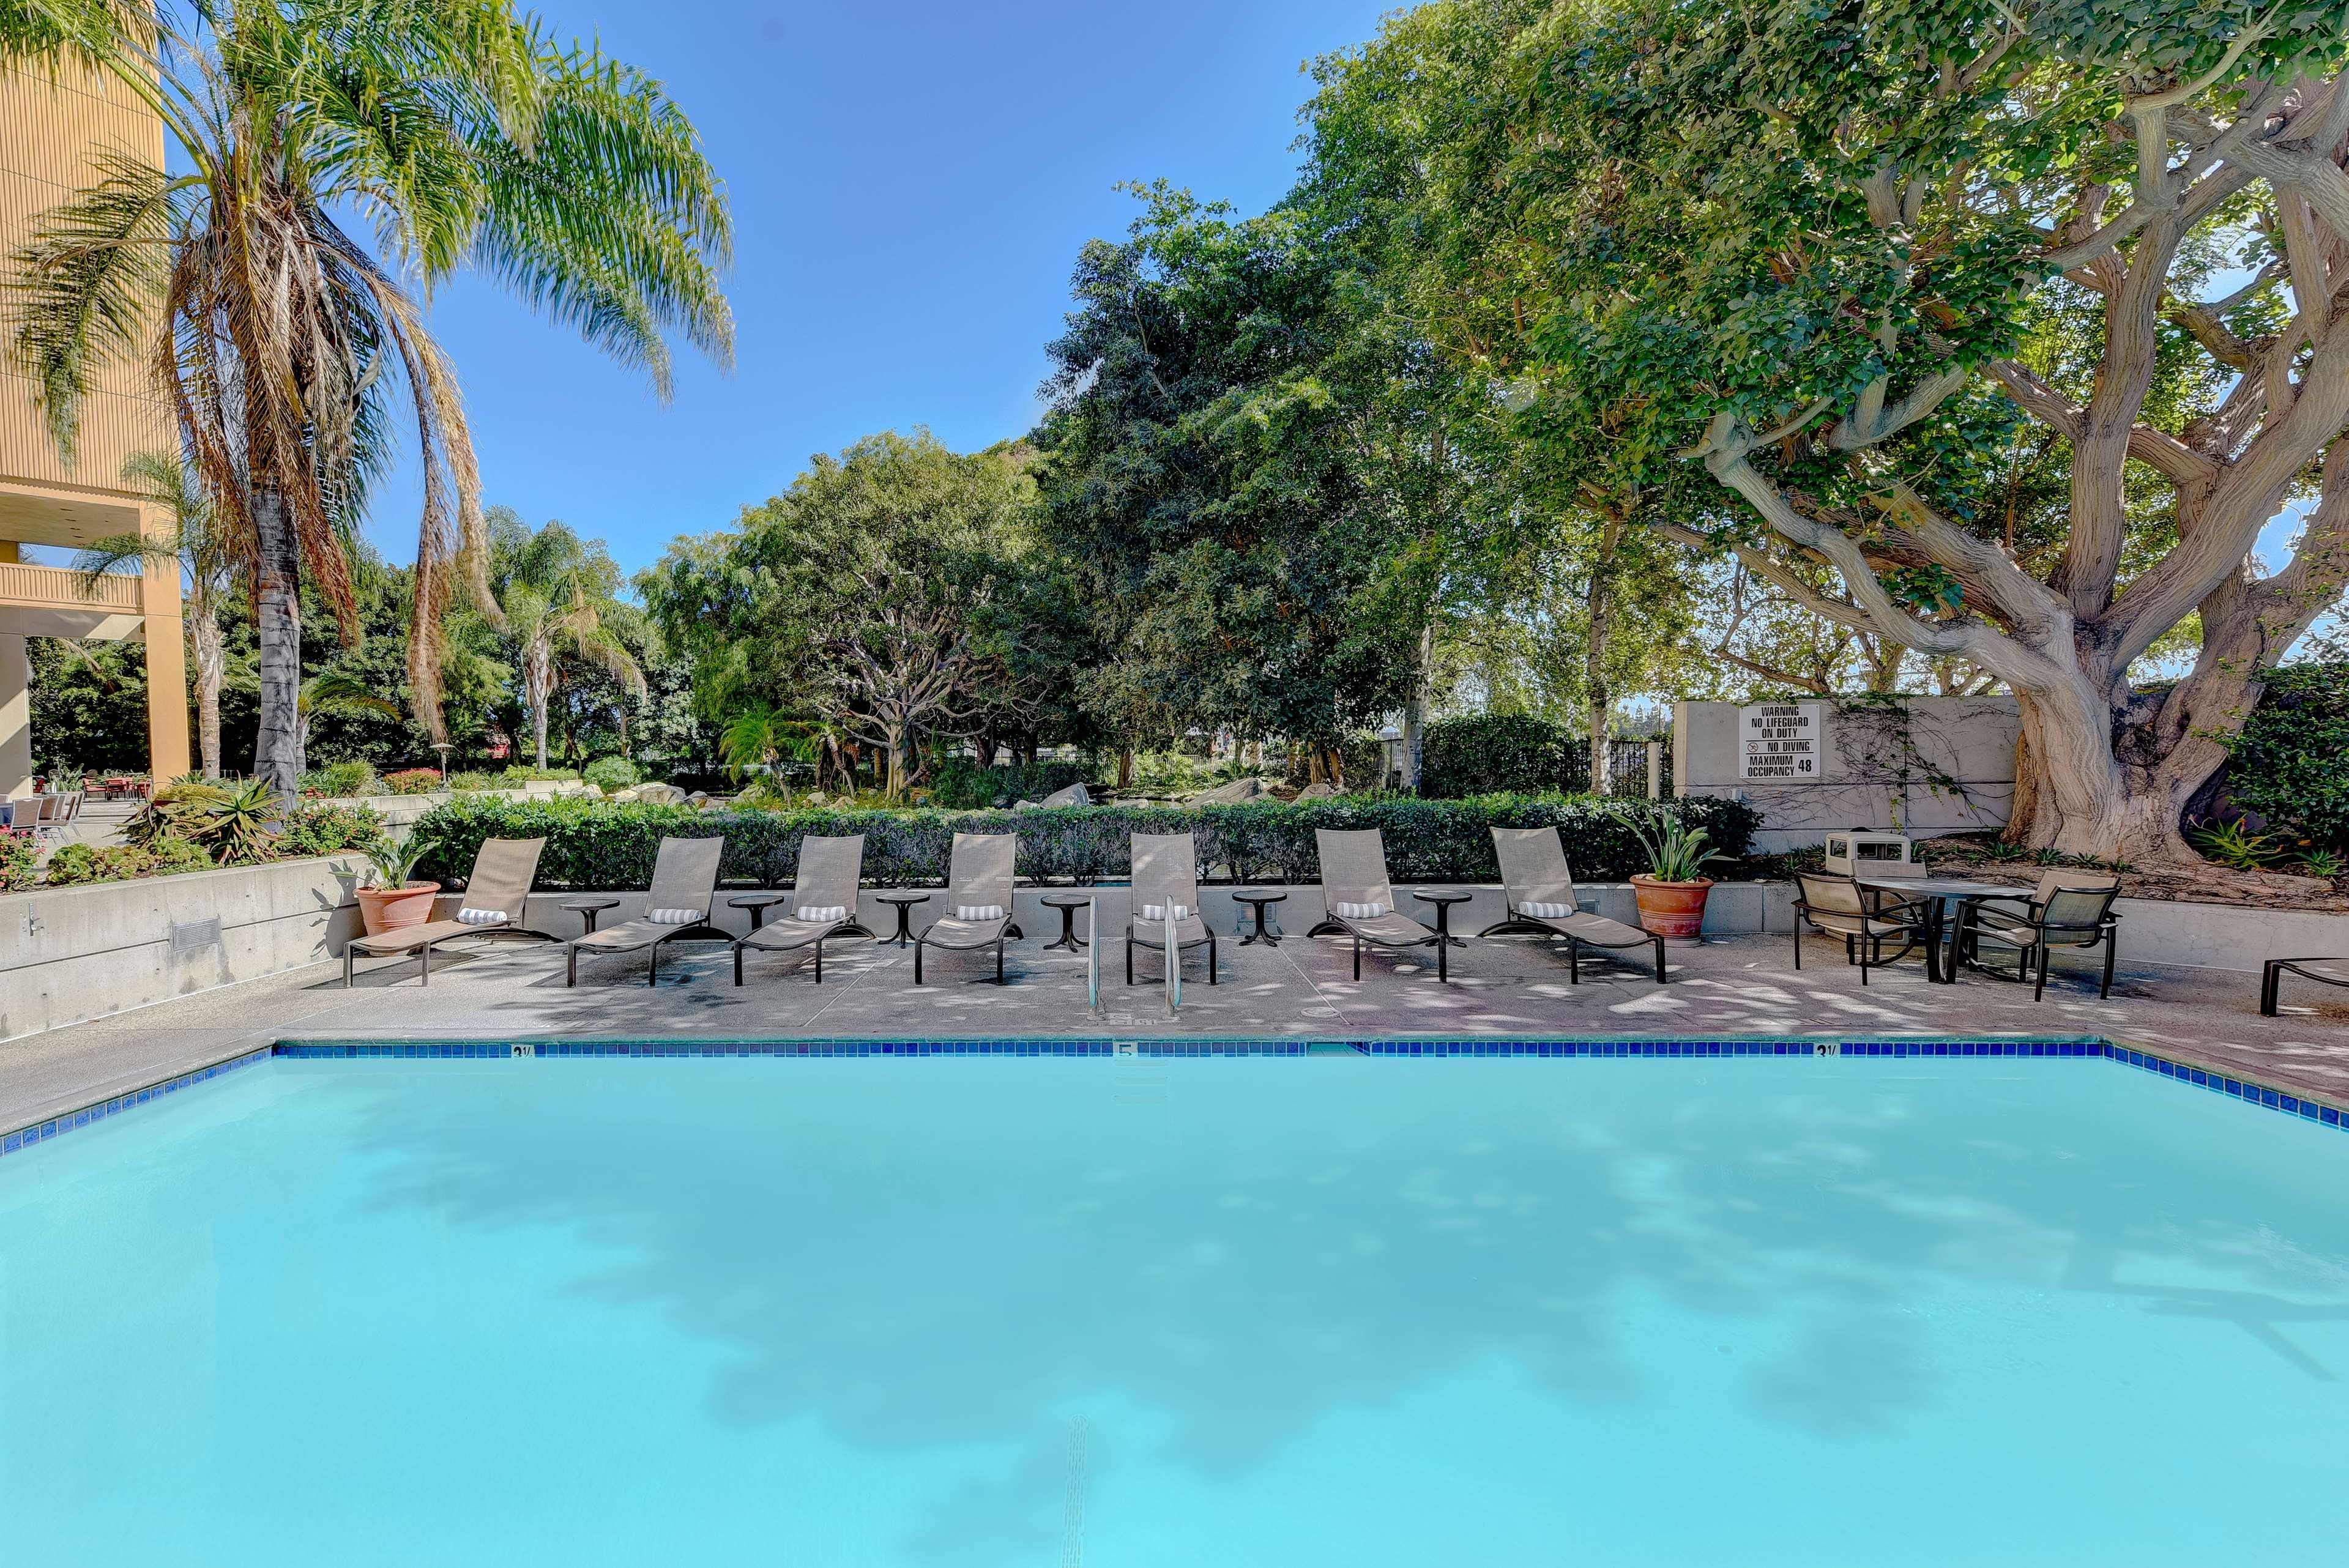 DoubleTree by Hilton Hotel Anaheim - Orange County image 19